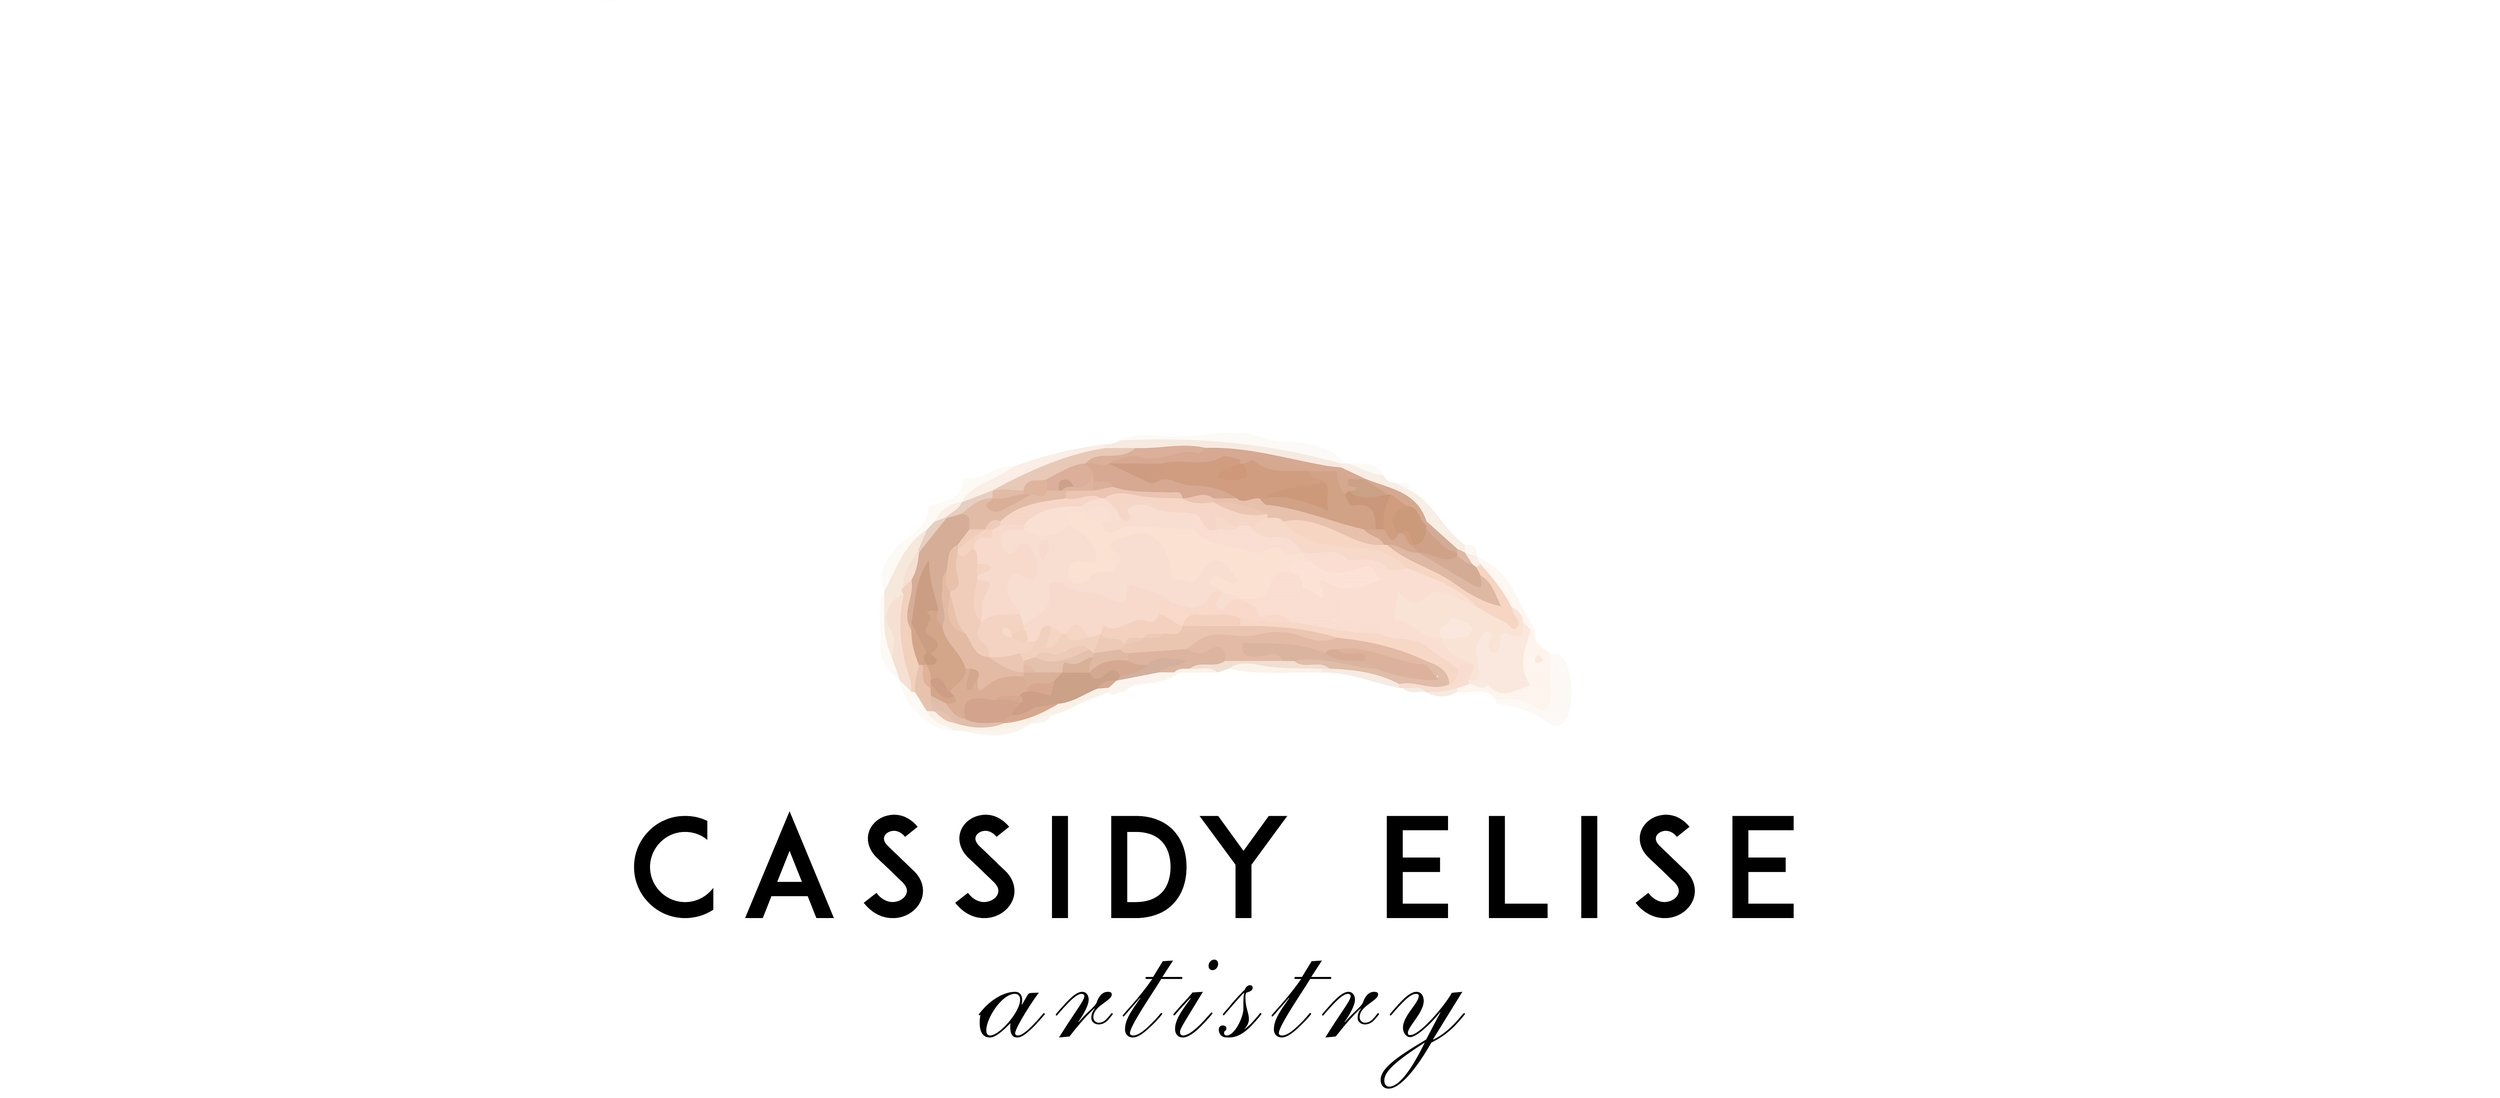 CASSIDY-ELISE.jpg